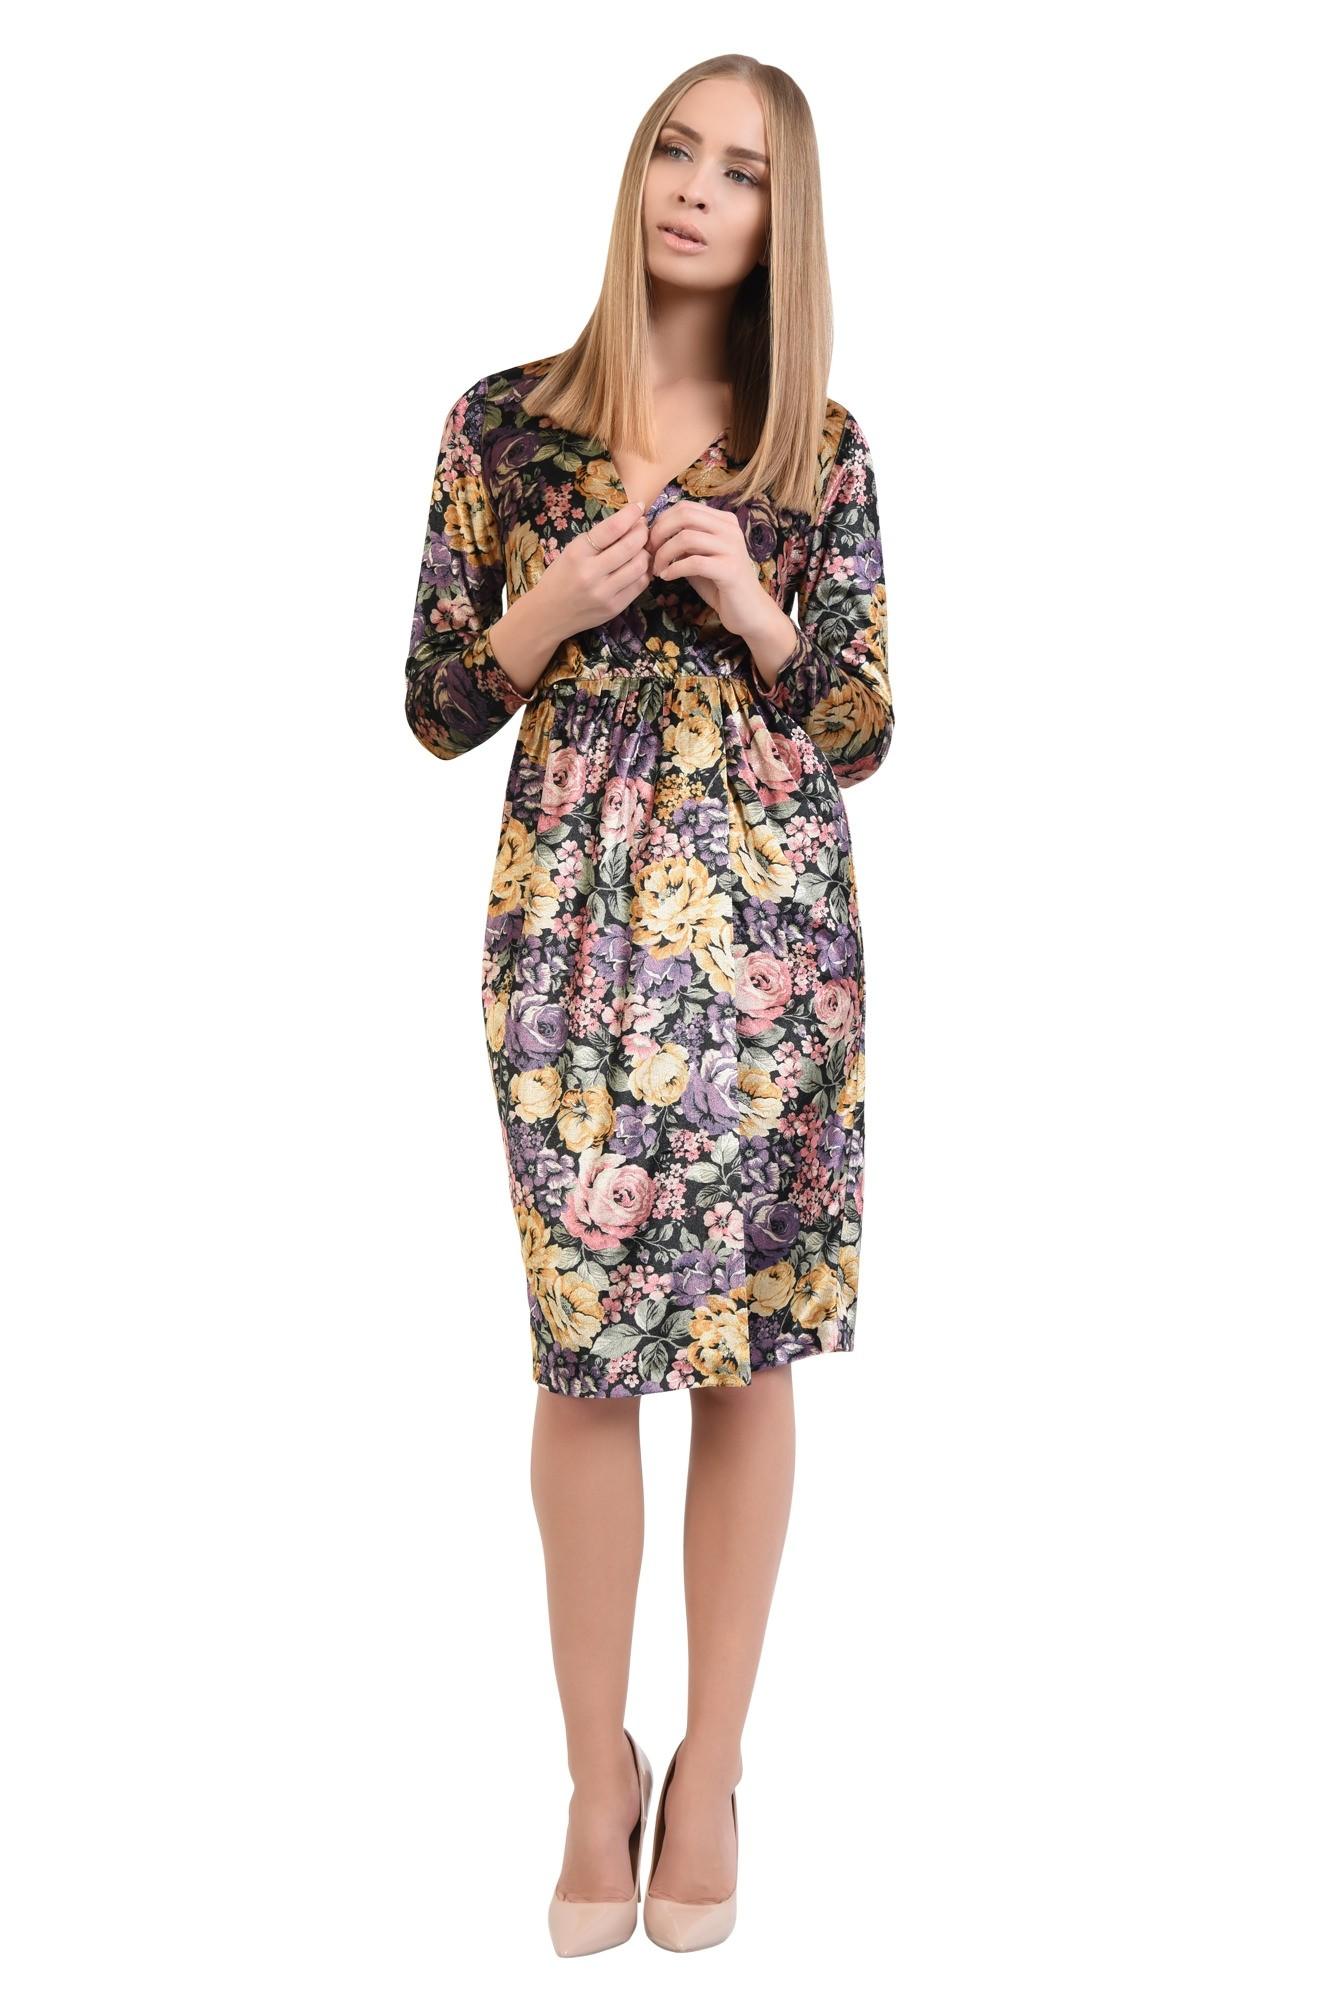 0 - rochie eleganta, imprimeu floral, midi, talie pe elastic